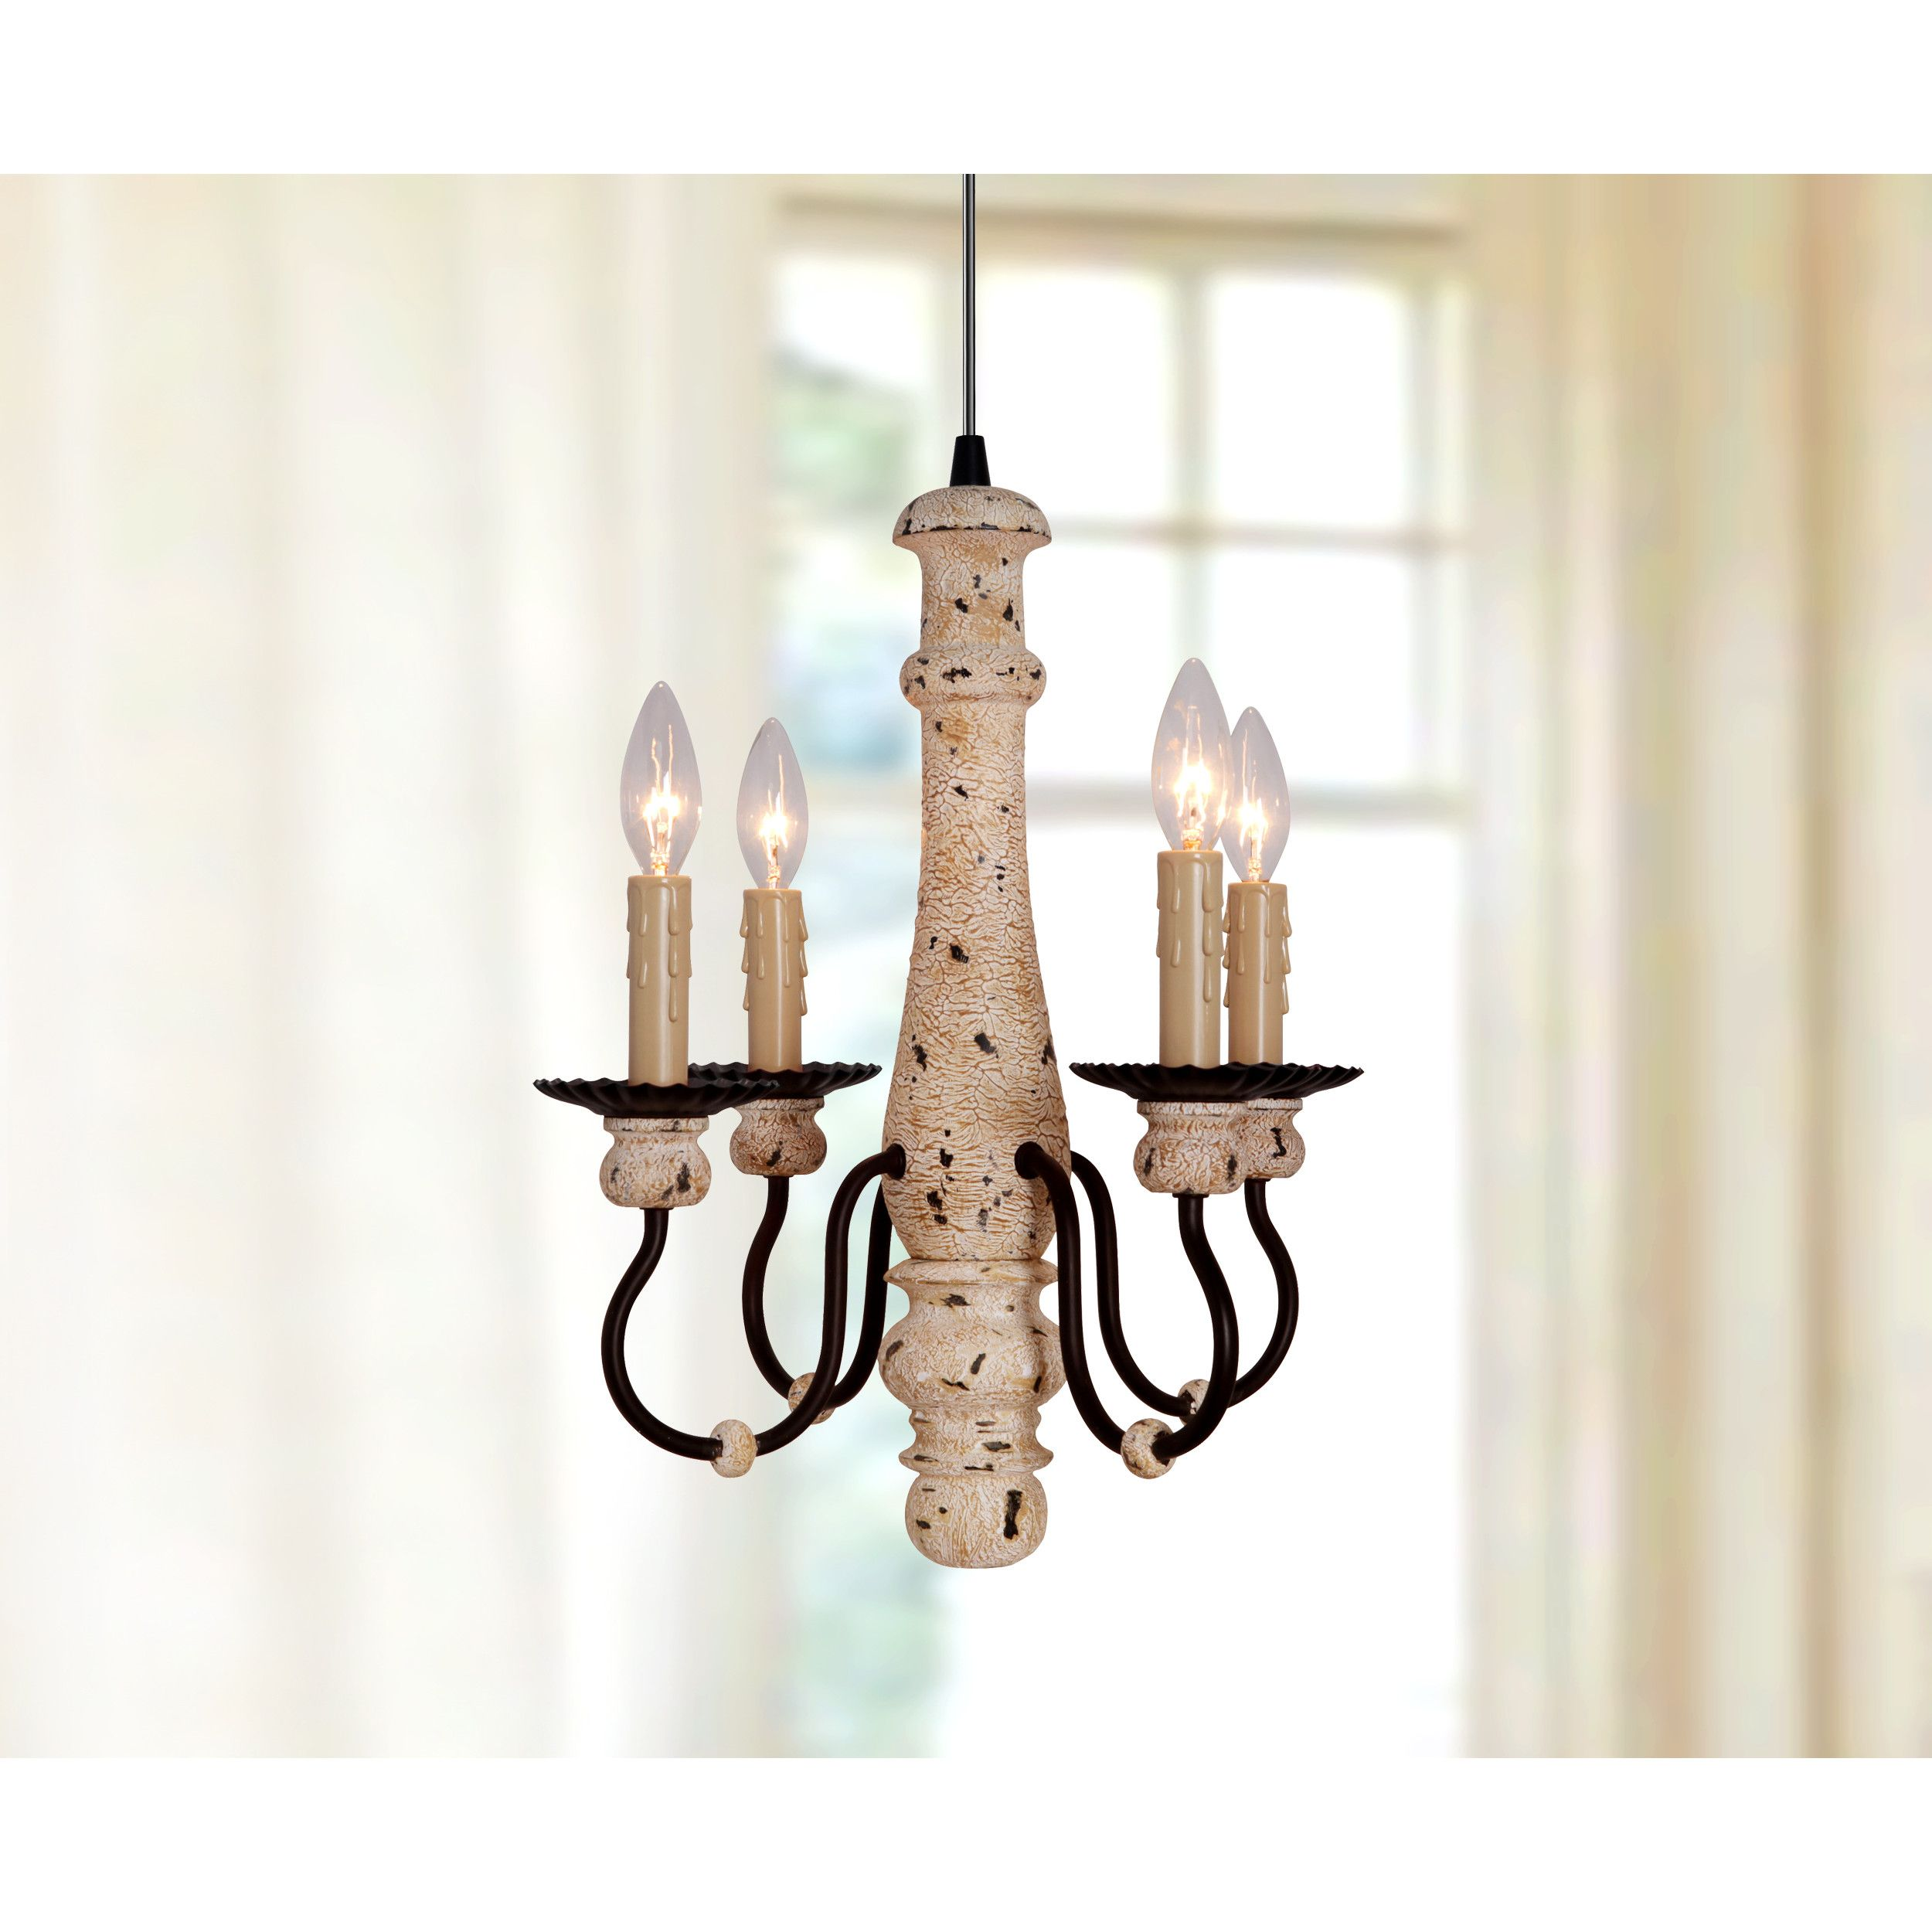 Worth home products light minichandelier recessed lighting